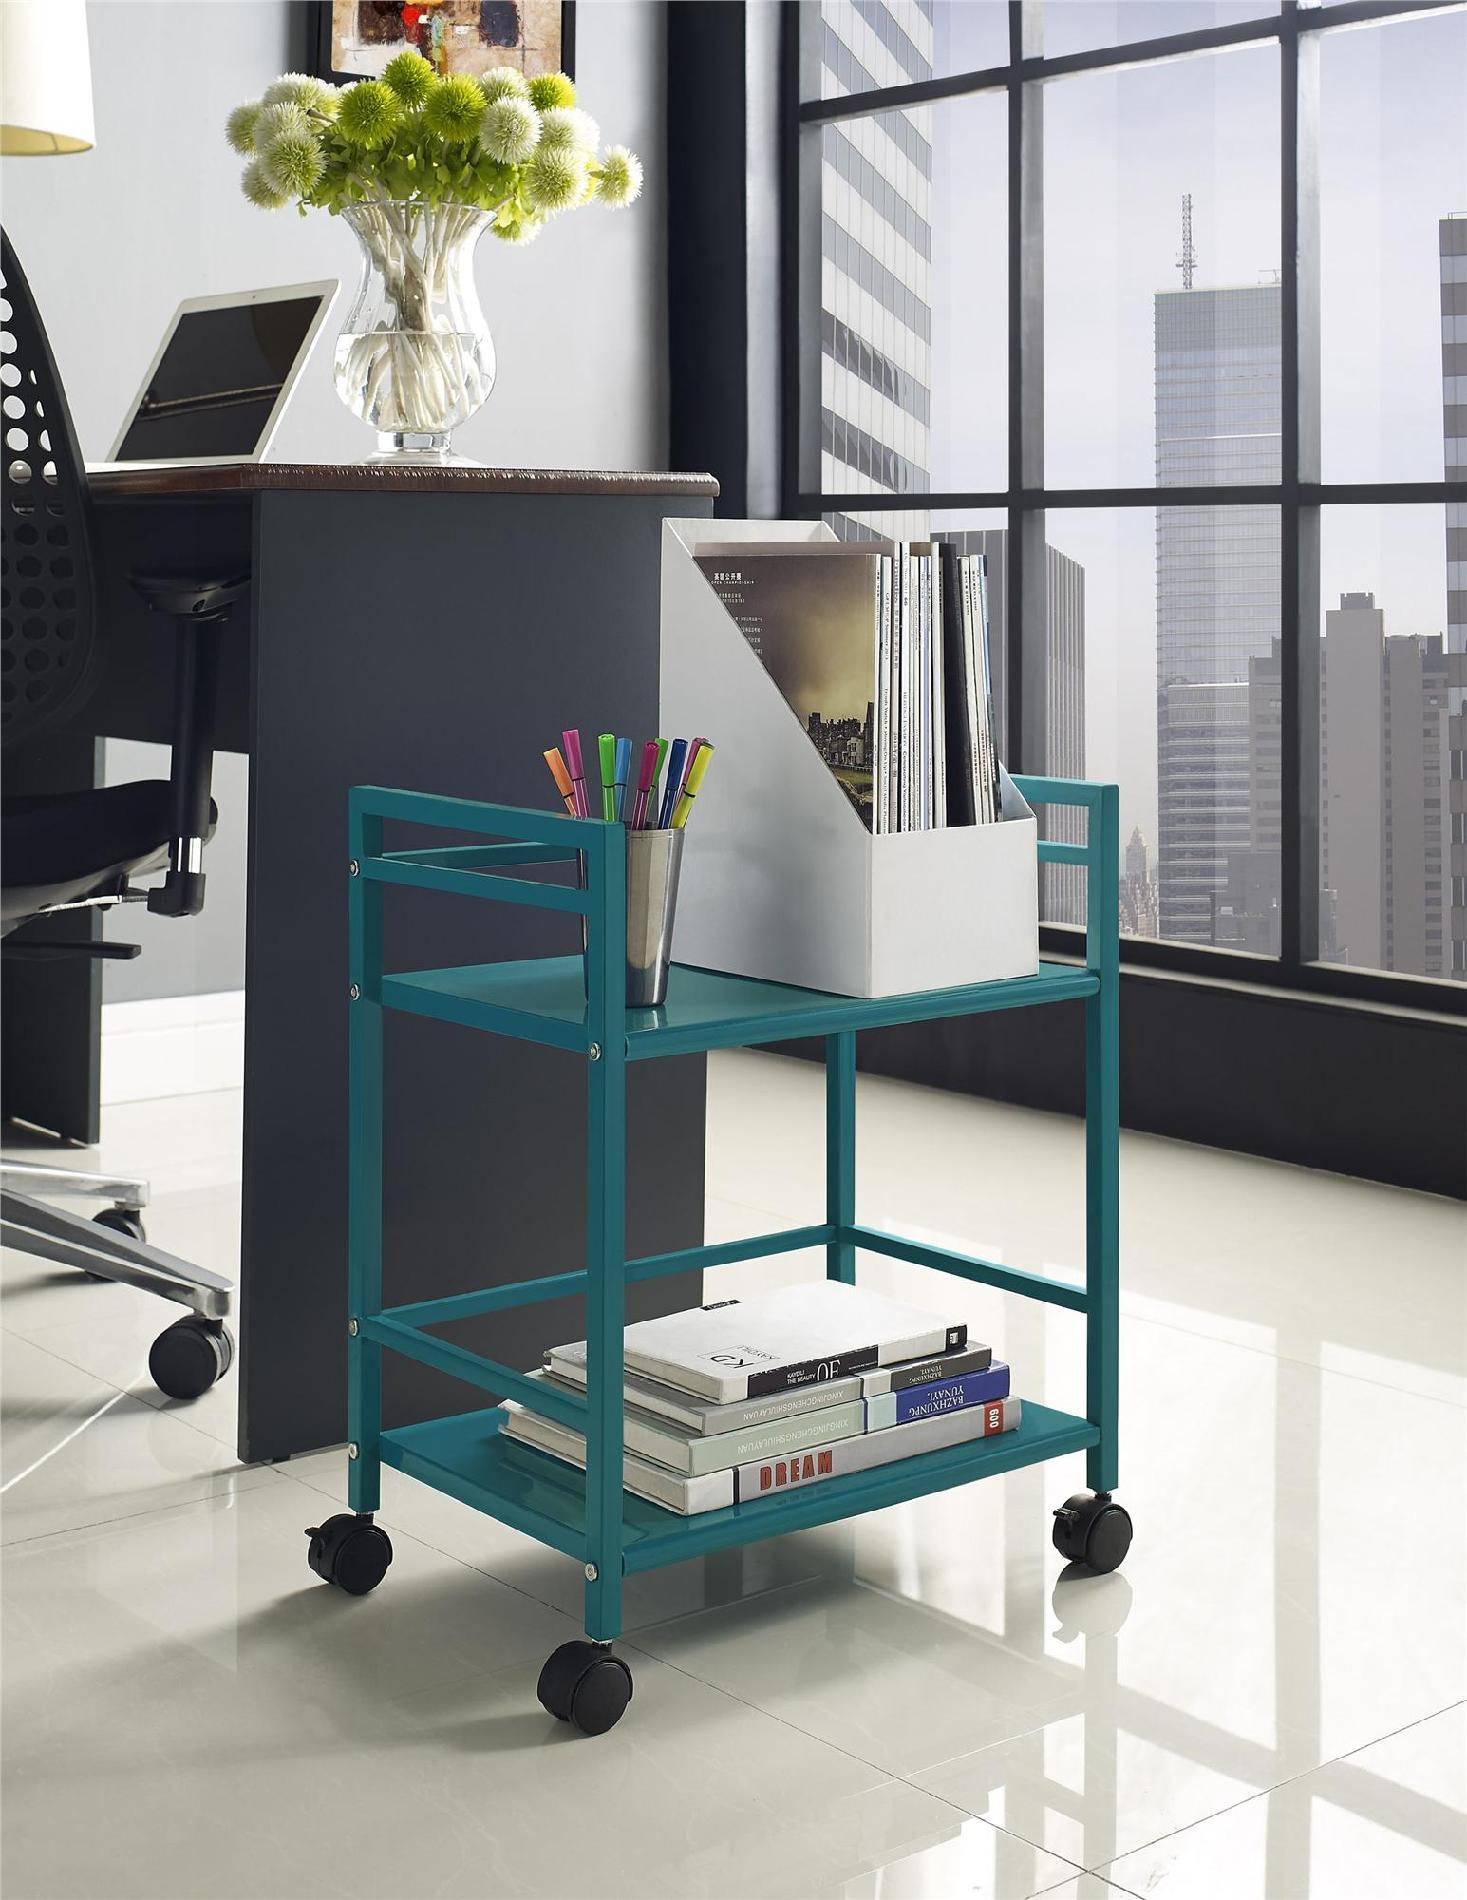 Dorel Home Furnishings Marshall 2-Shelf Metal Rolling Utility Cart Multiple Colors